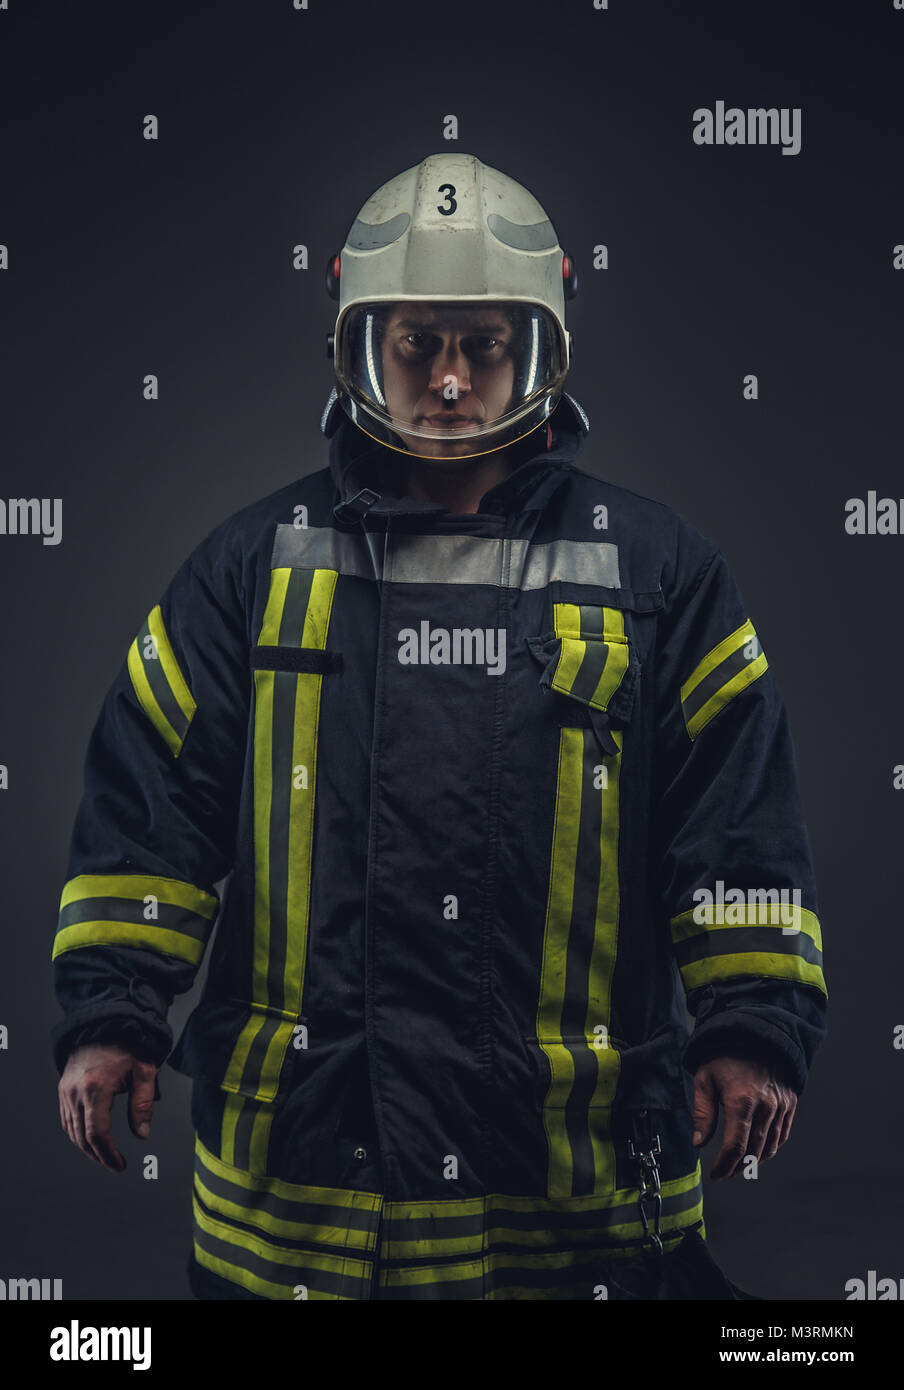 Imagen de bombero en uniforme. Foto de stock